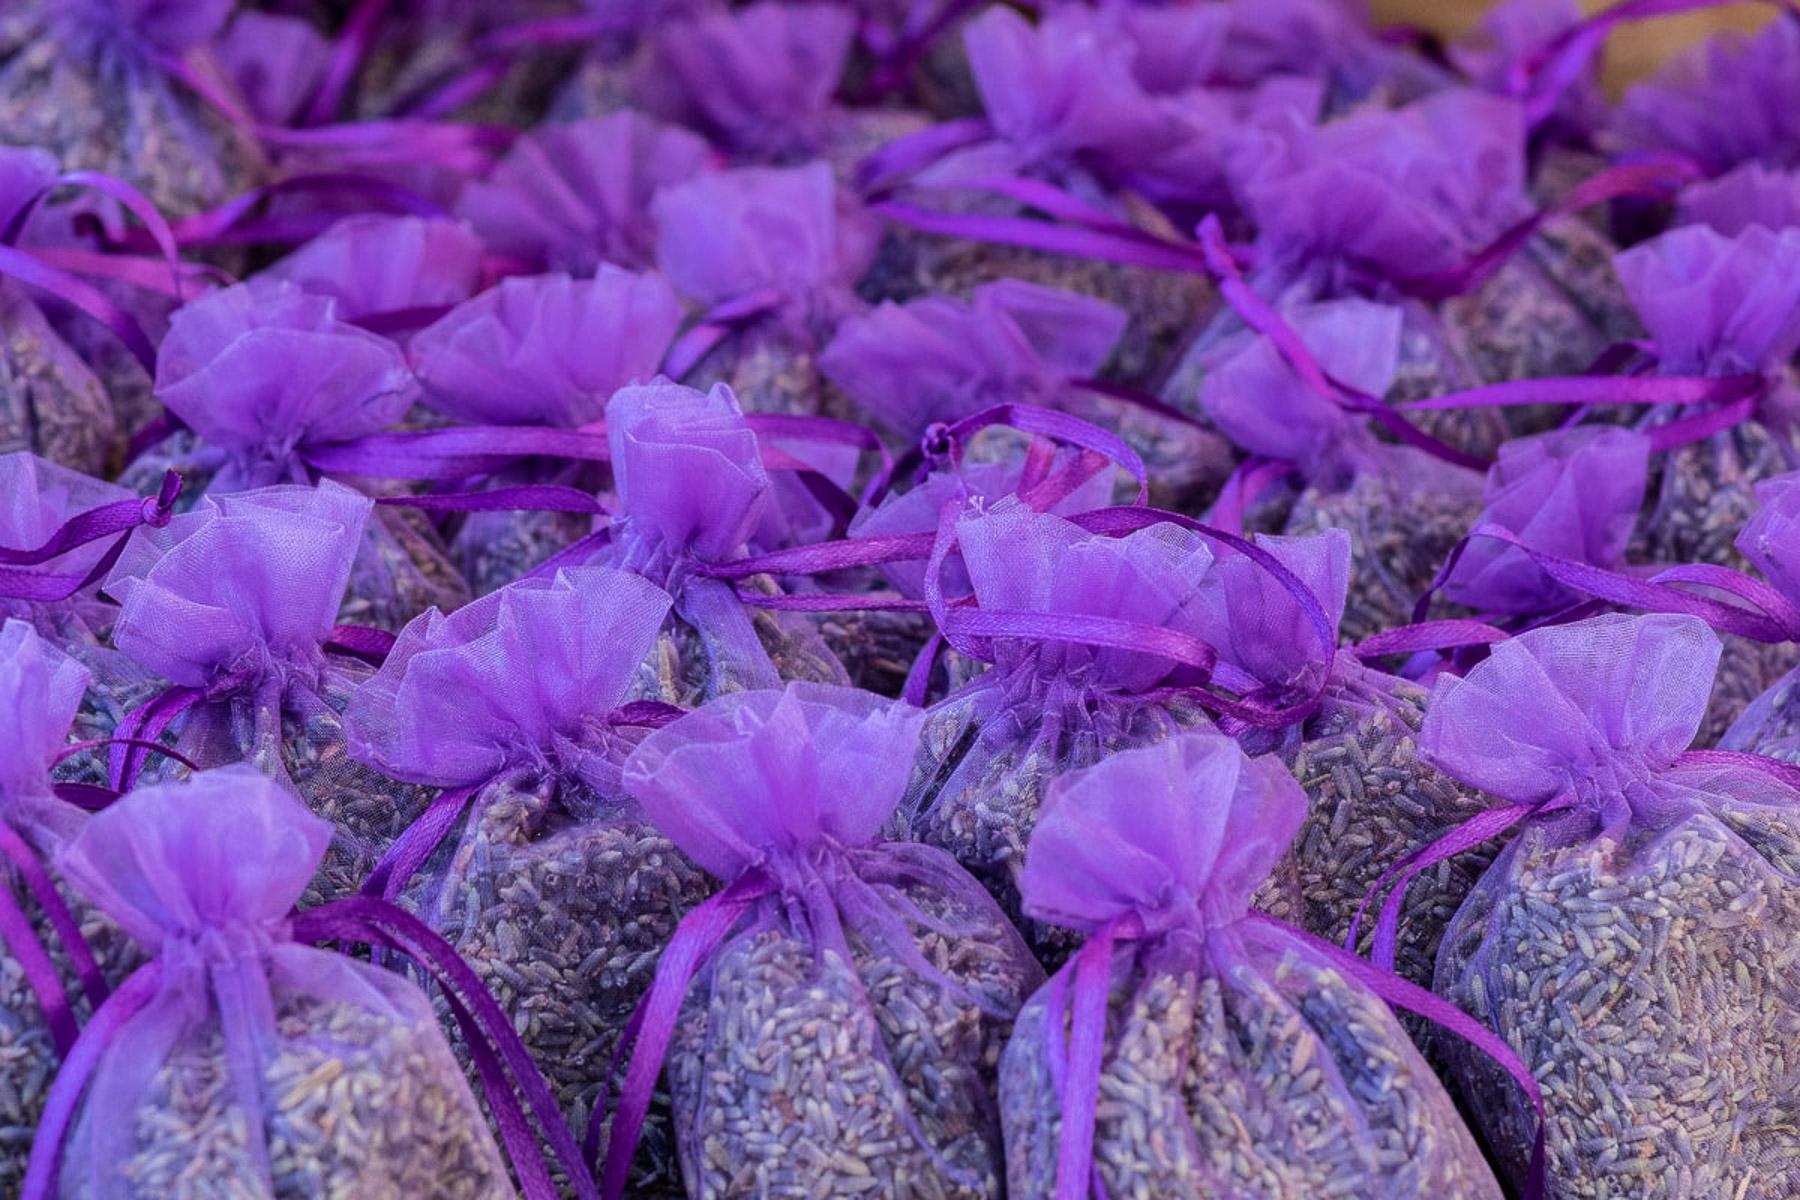 Lavendelsäckchen (Foto: Reiner Gruhle)